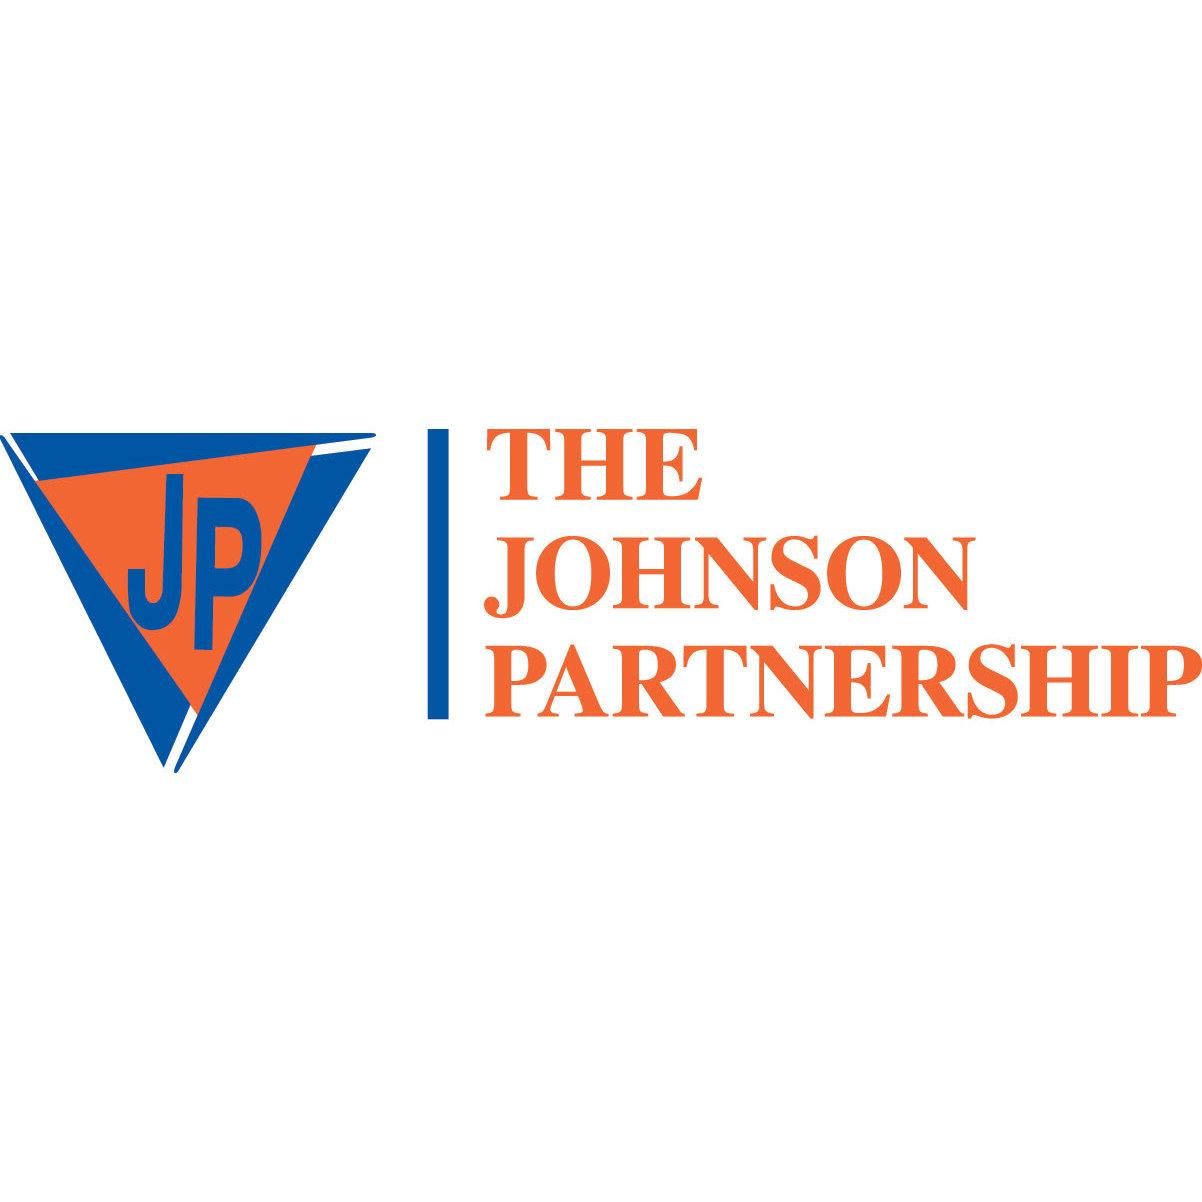 The Johnson Partnership Solicitors